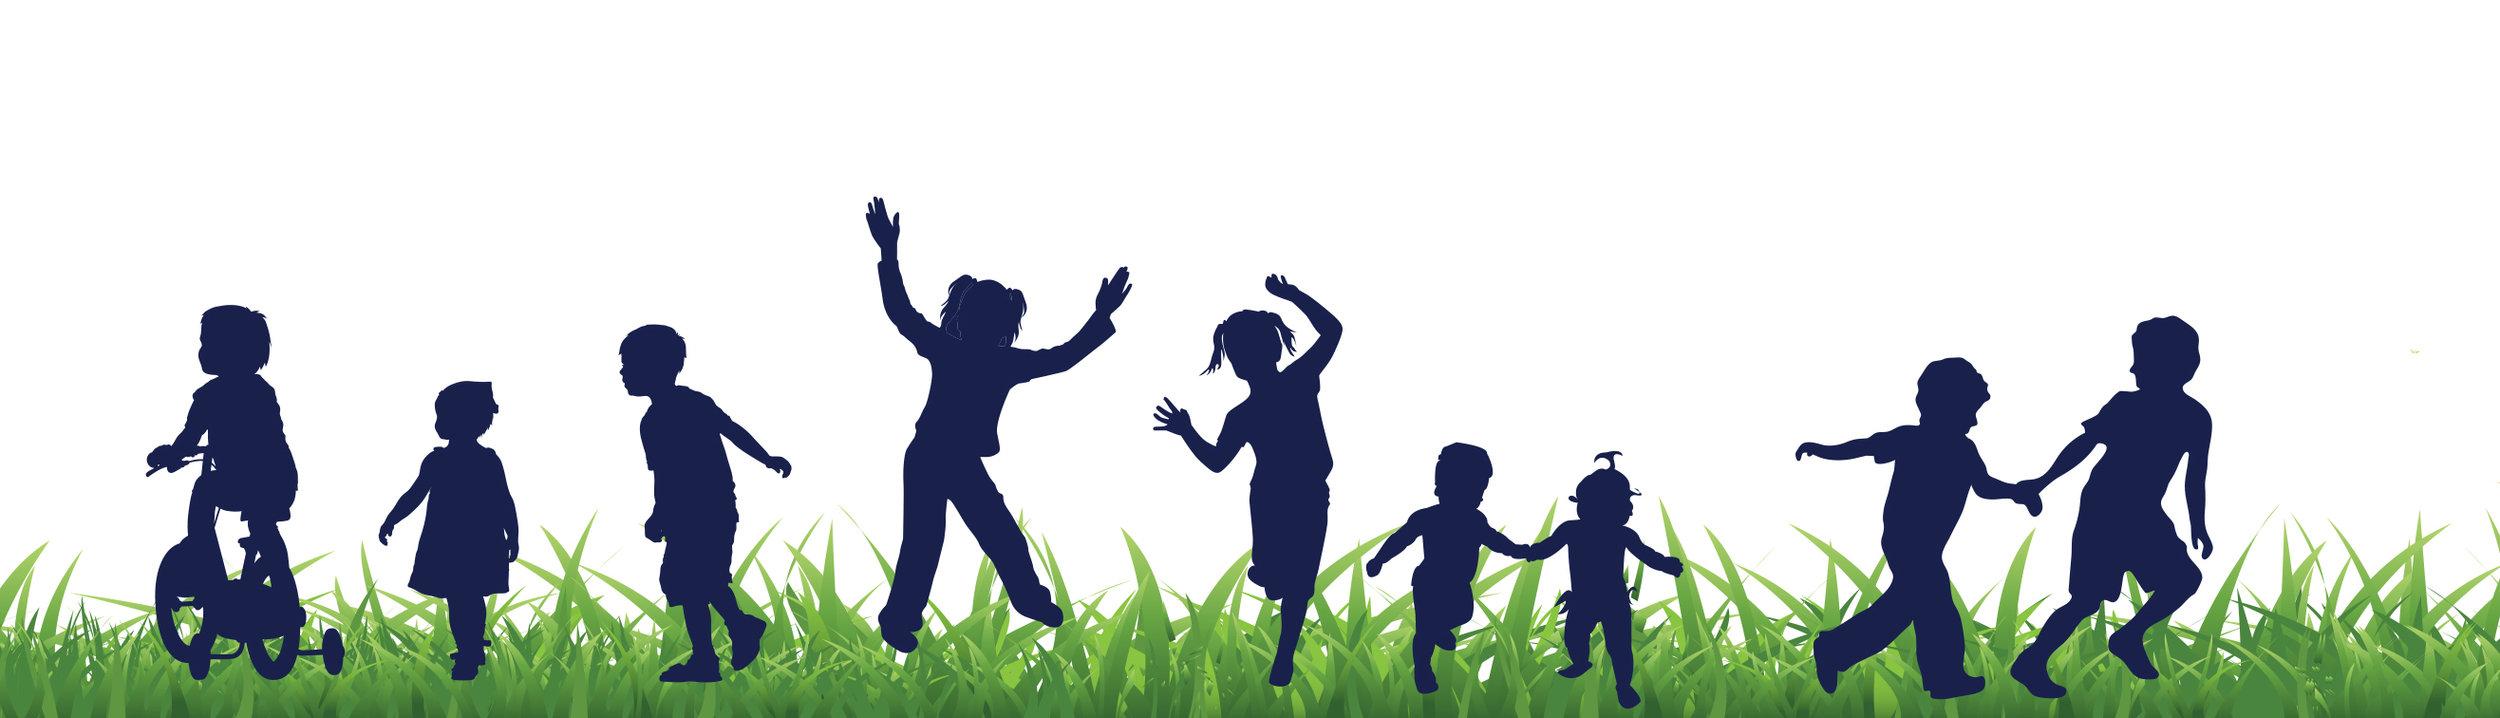 children-rockhmpton.jpg